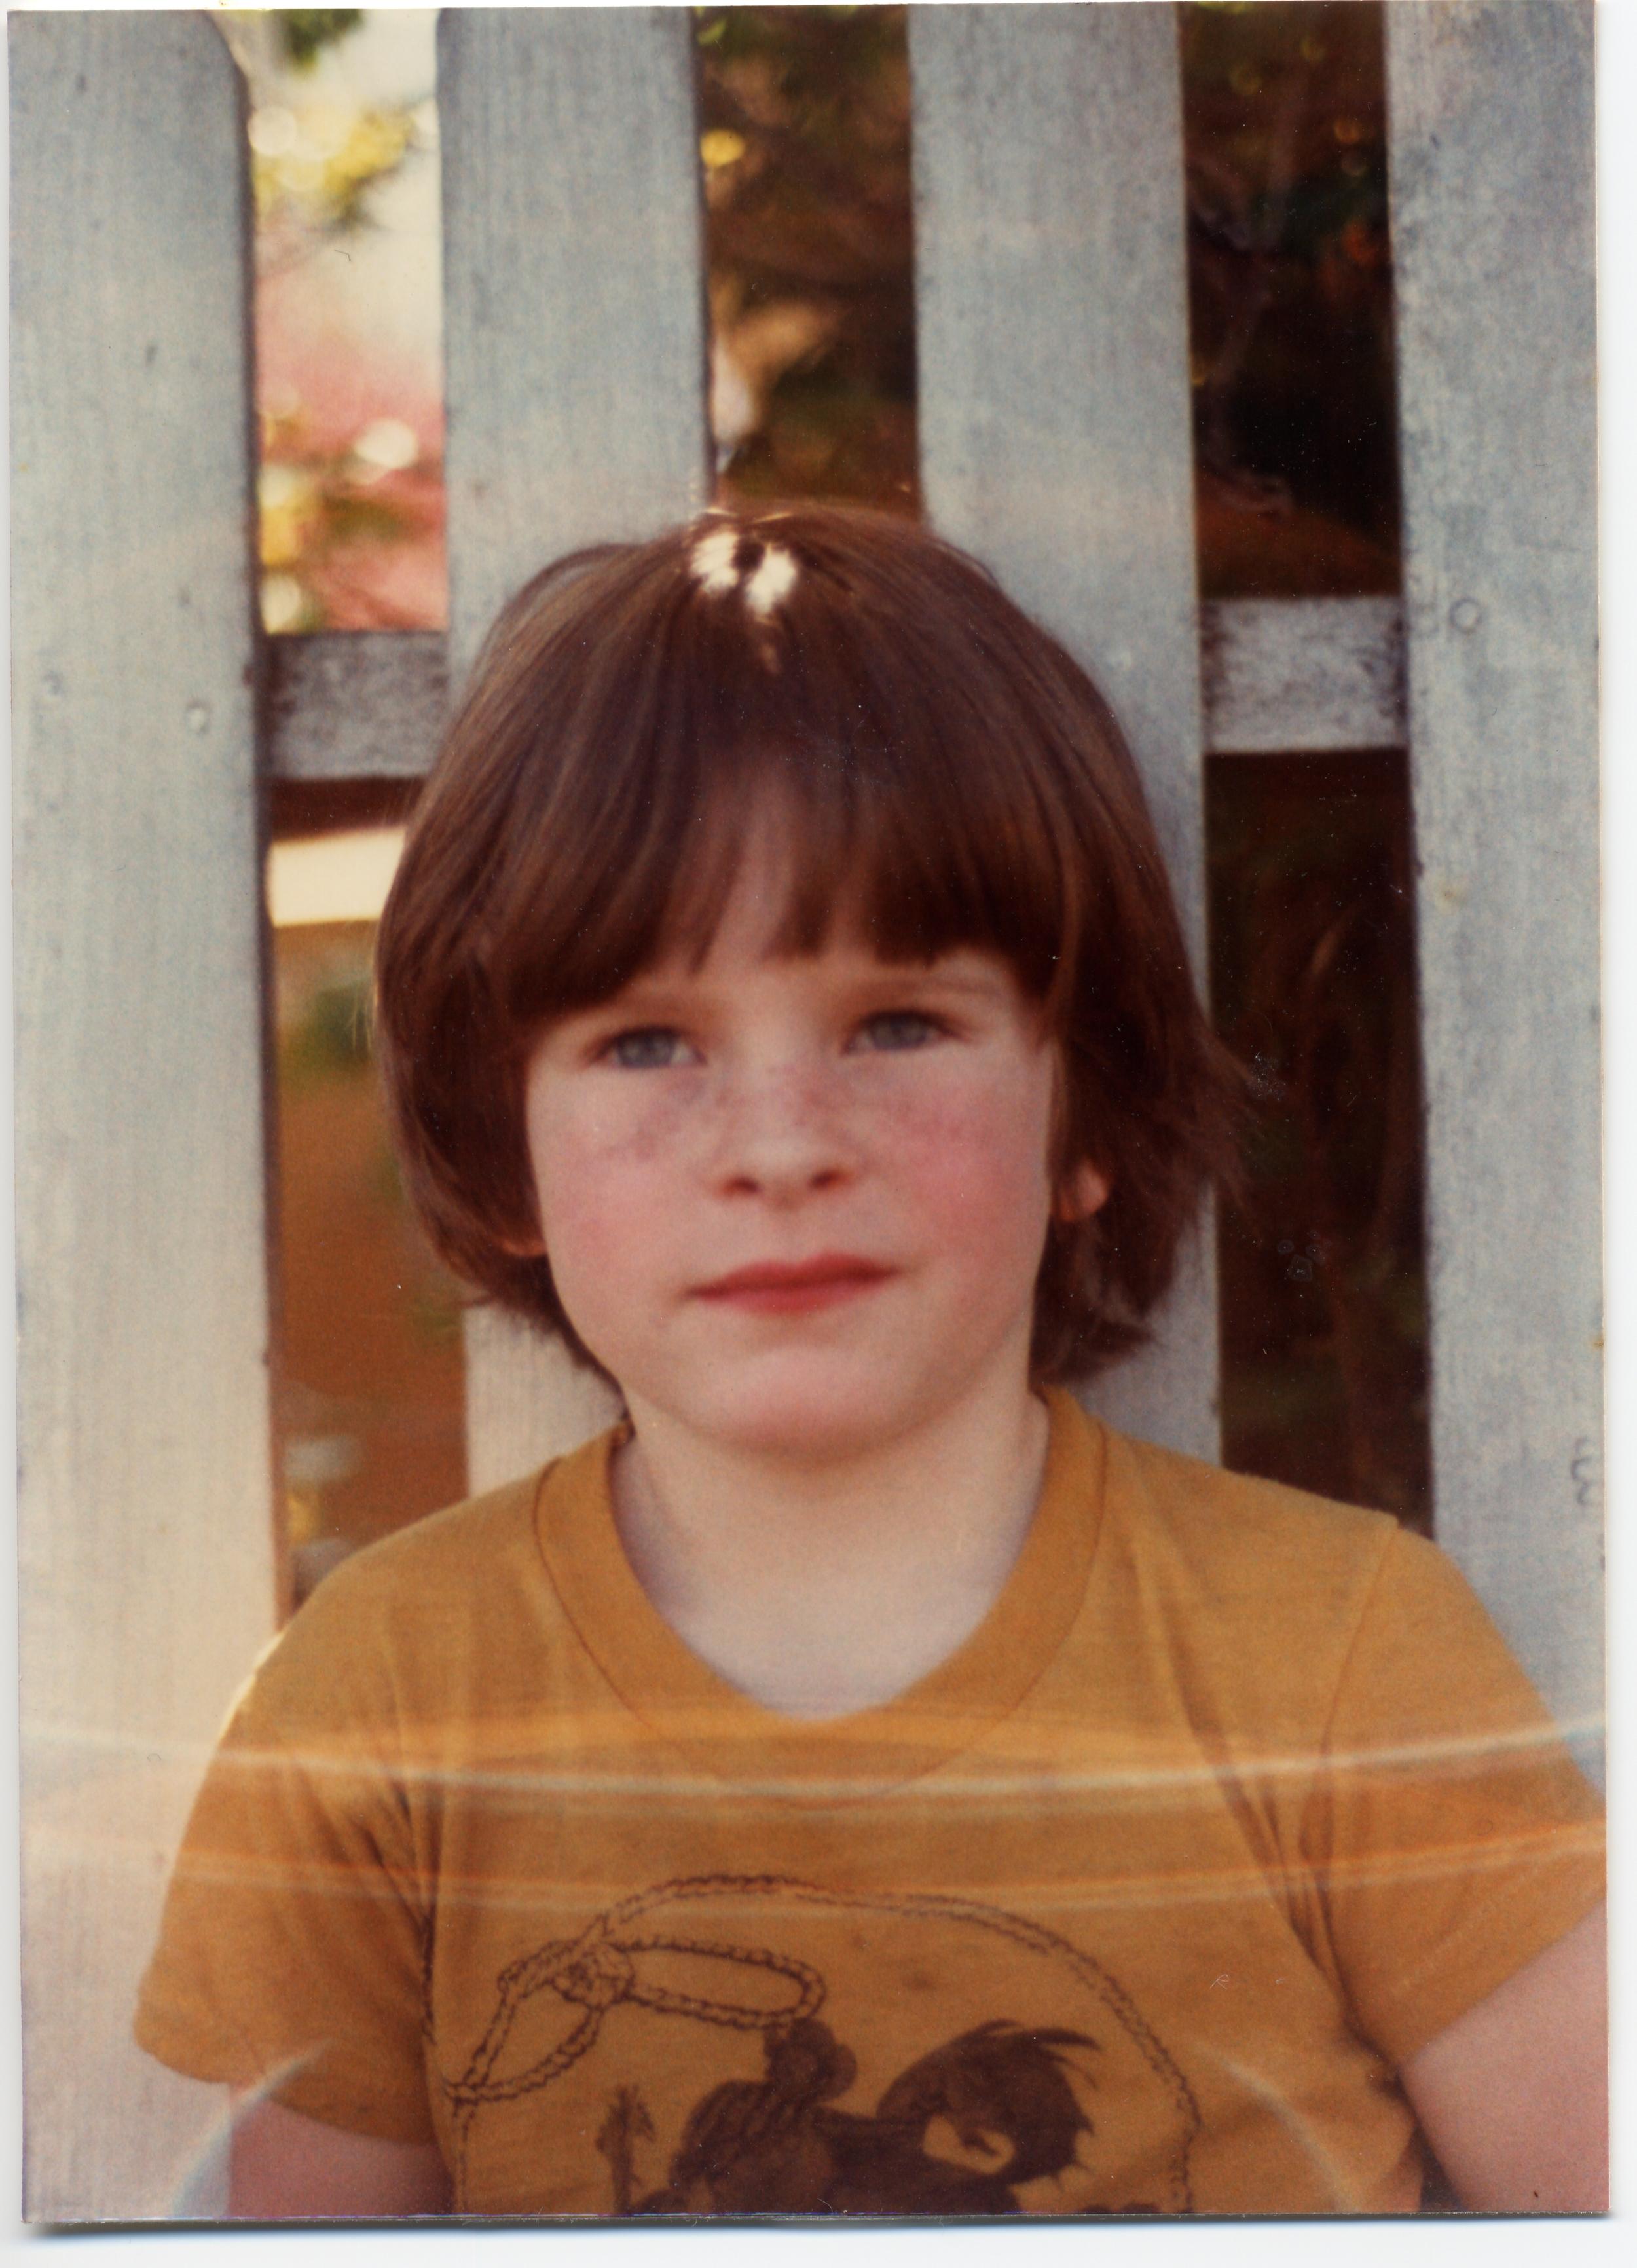 1980 JESSE WAUGH COWBOY SHIRT.jpg